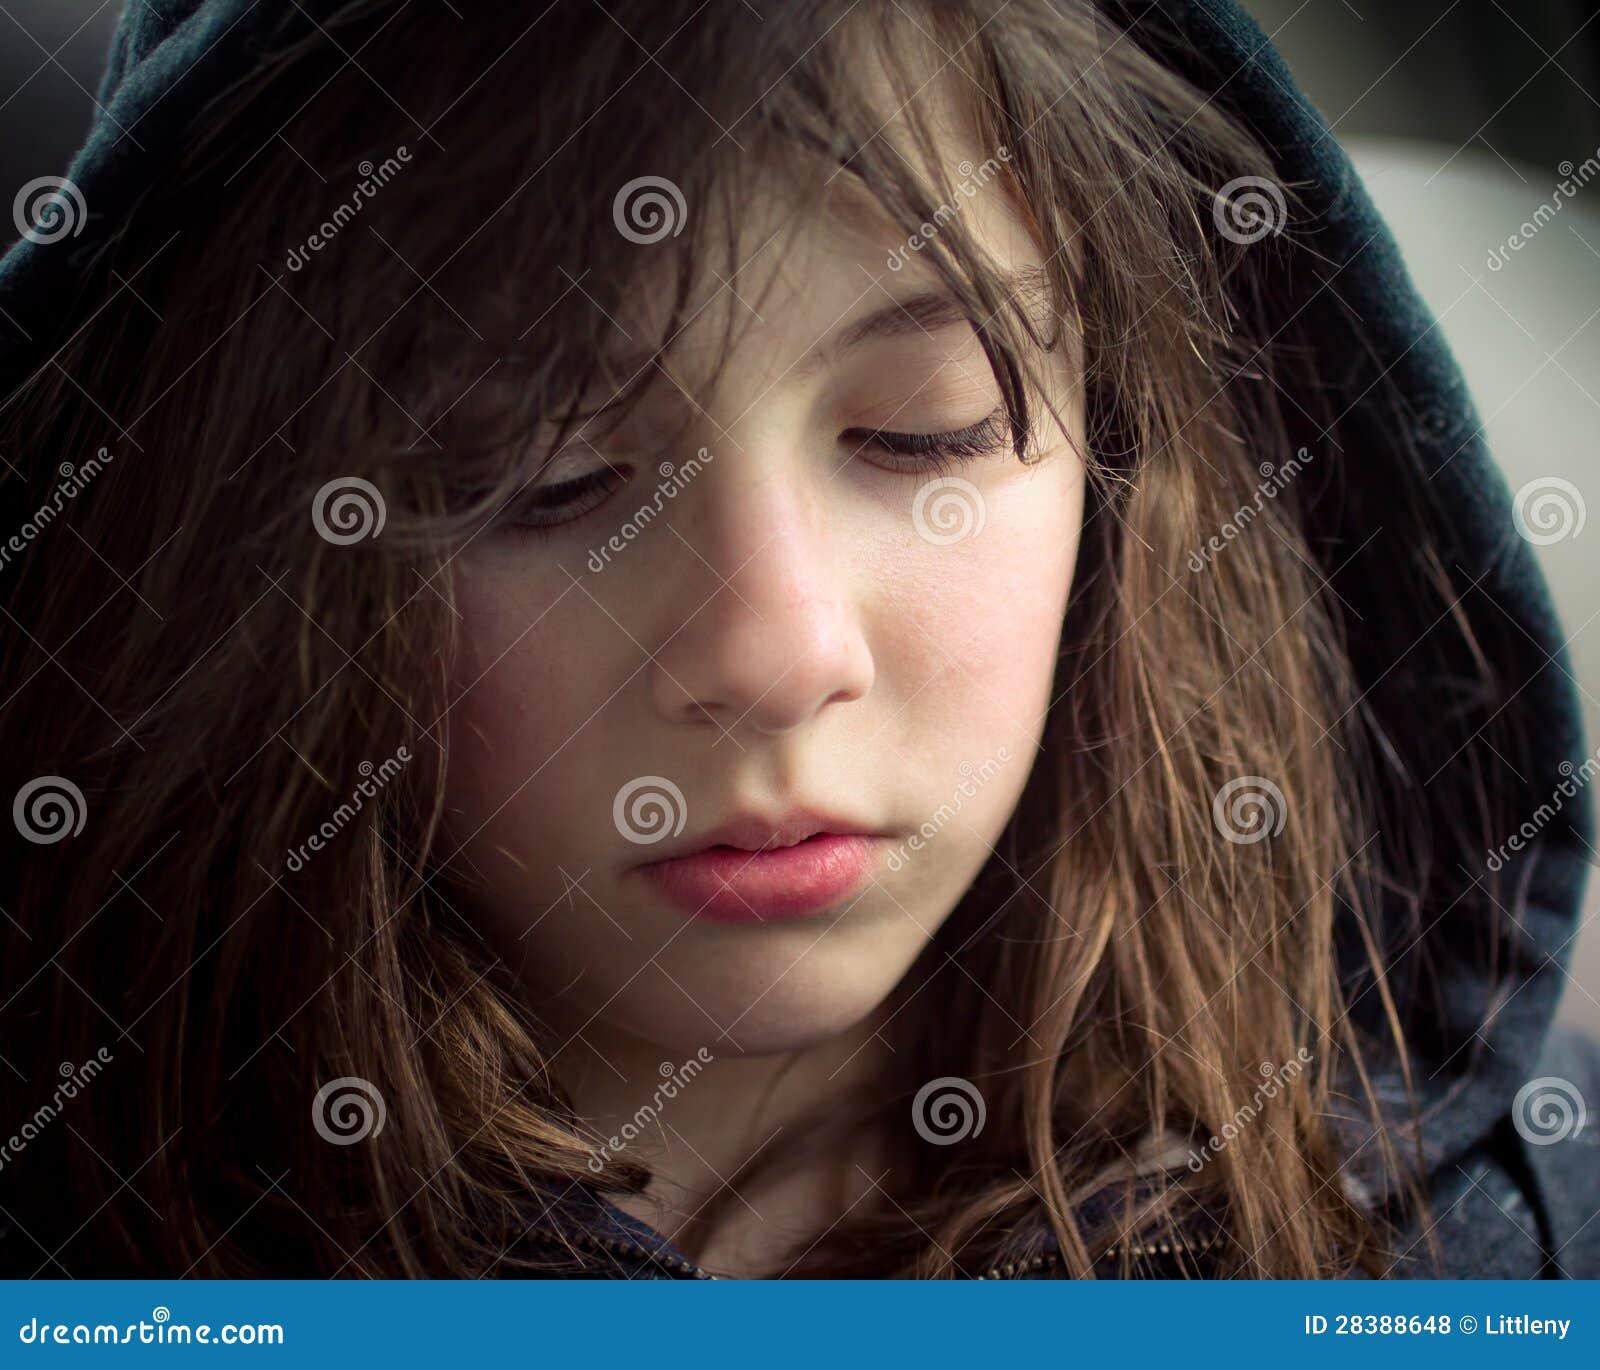 Sad Emotional Pics: Sad Girl Royalty Free Stock Photos